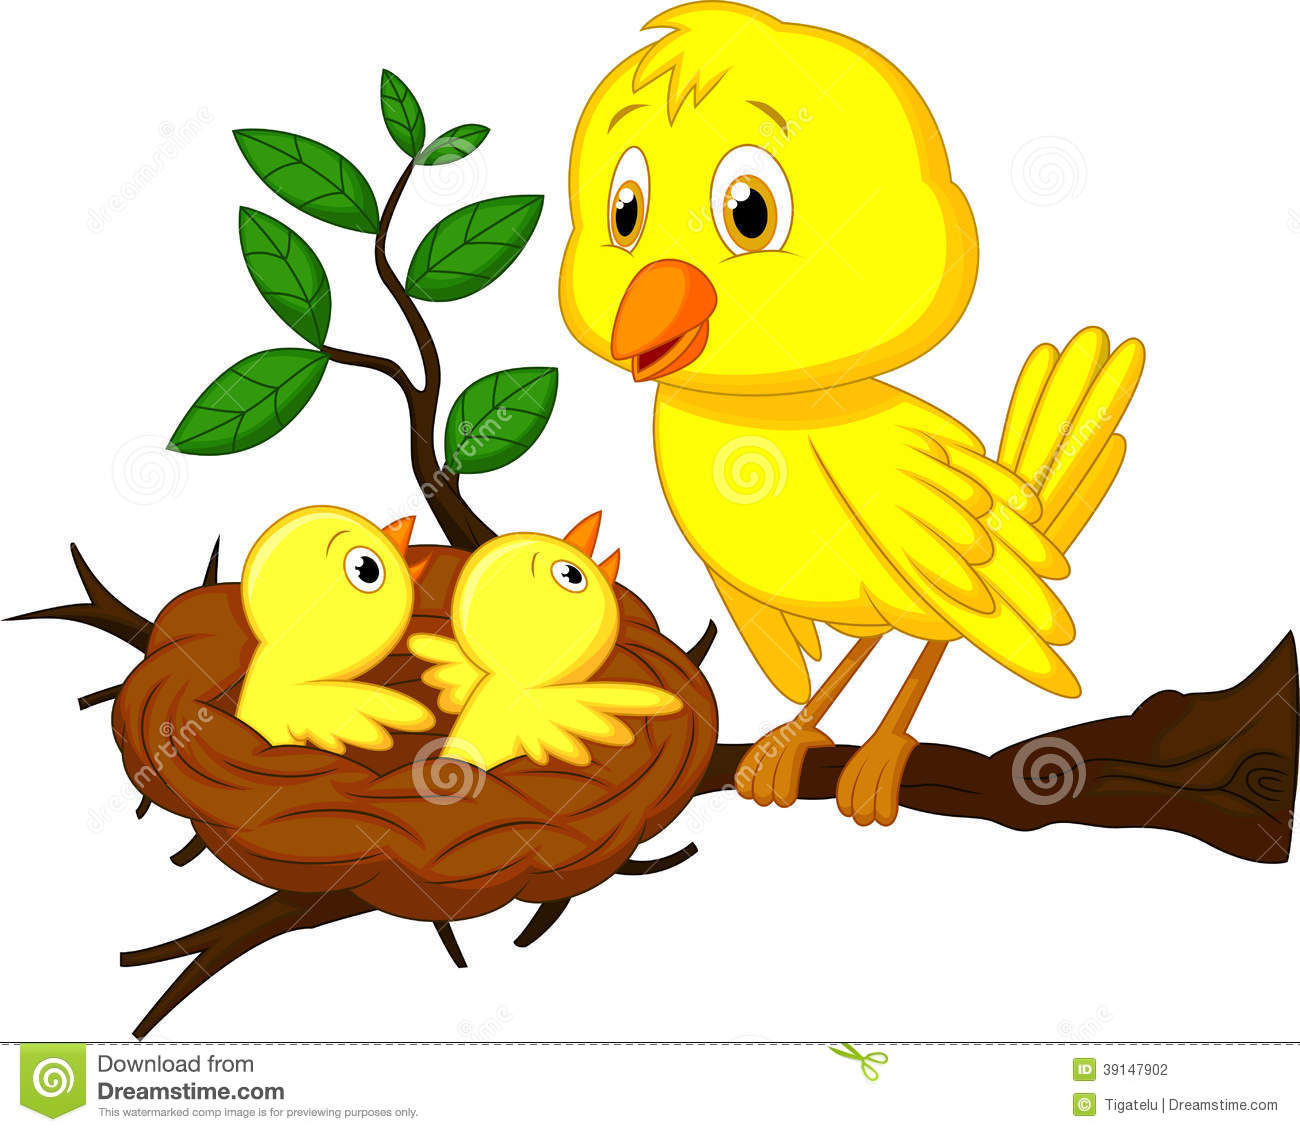 6+ Bird Nest Clipart | ClipartLook picture download